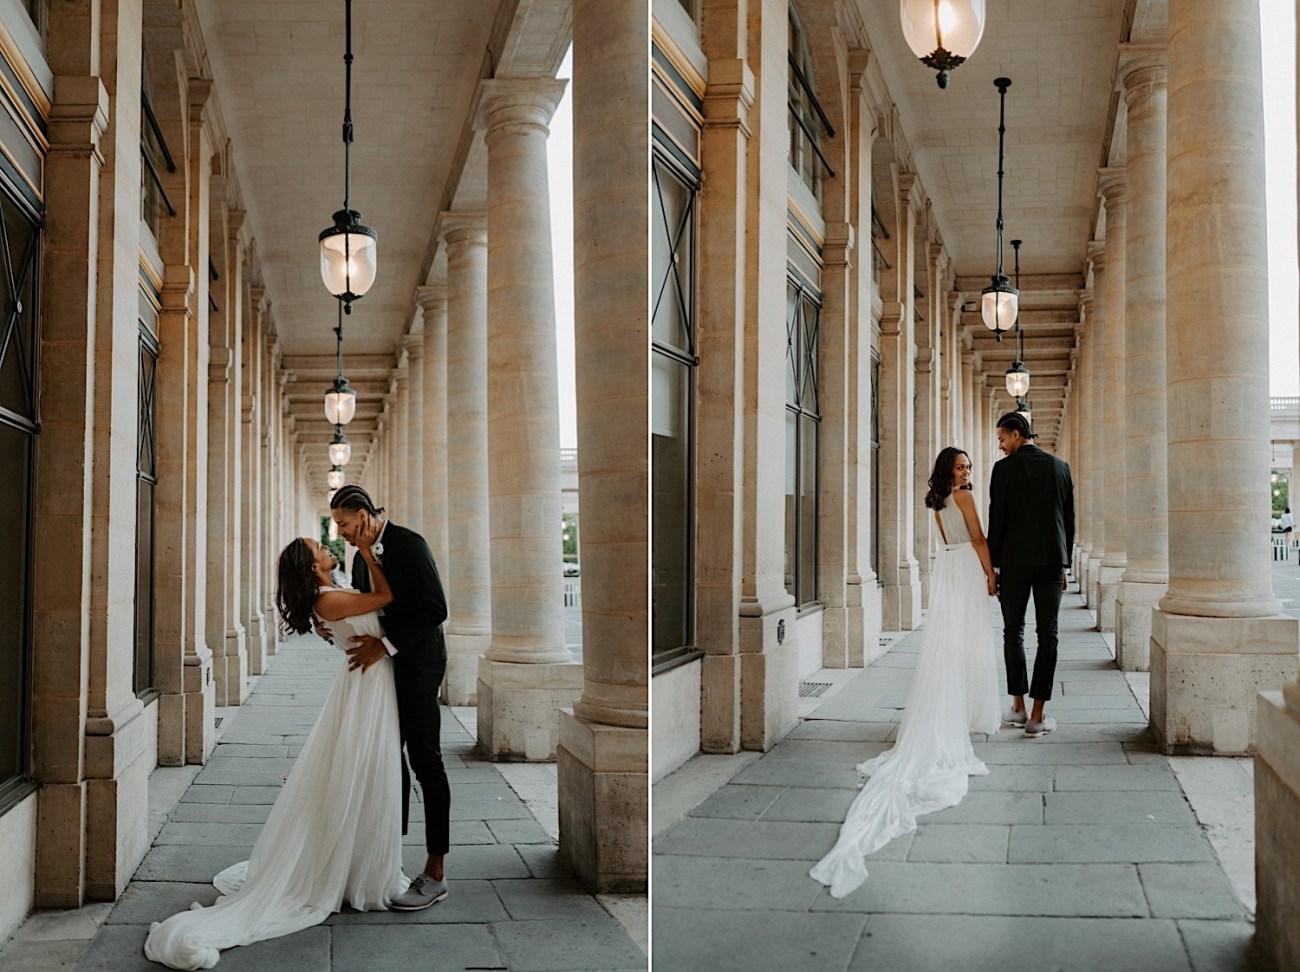 Paris Louvre Wedding Photos Paris Wedding Photographer Destination Wedding France Anais Possamai Photography 06